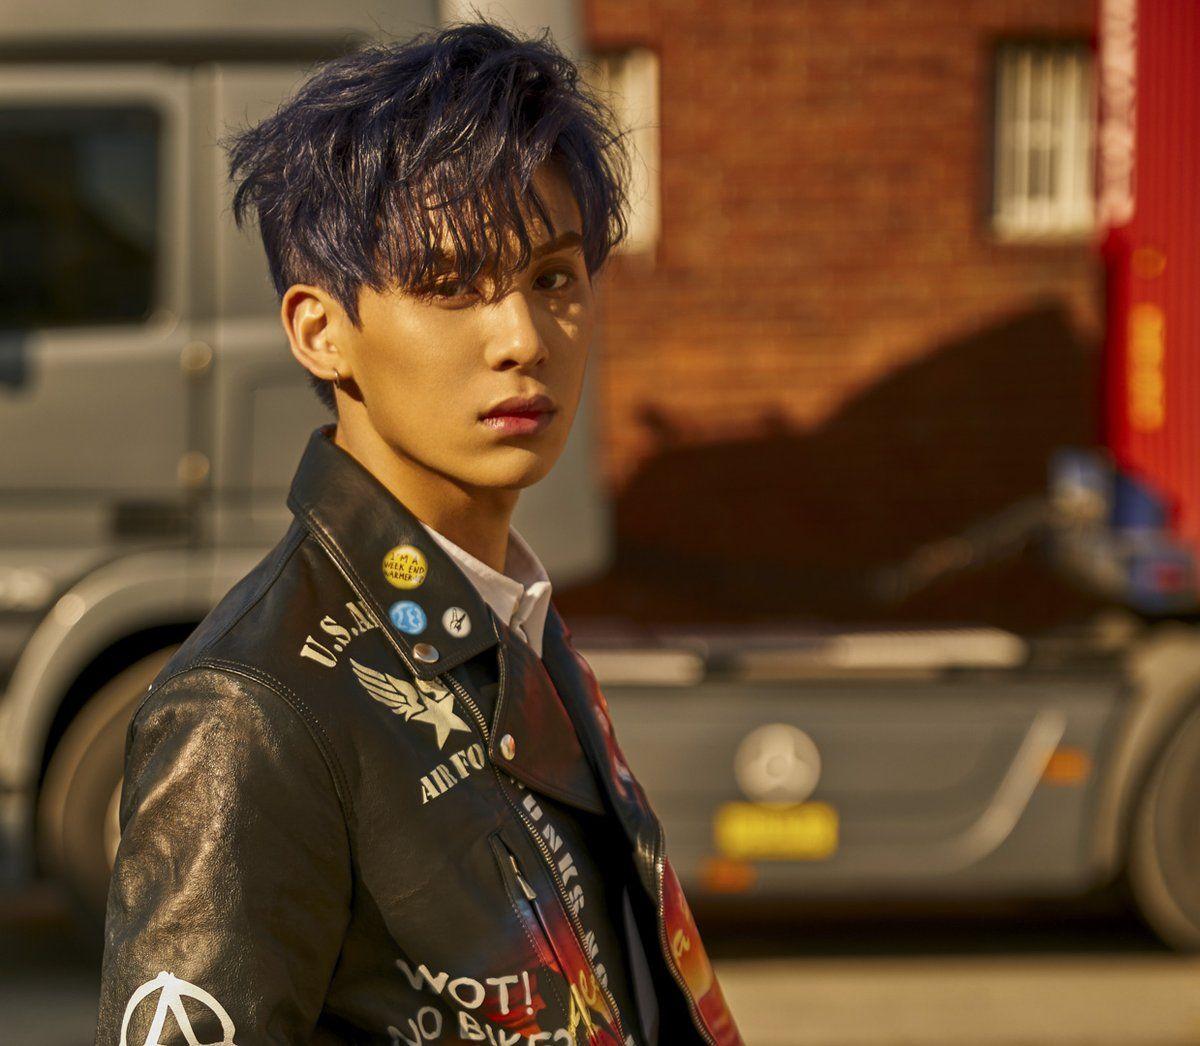 sf9, burning sensation, roar, car, kpop, 2017 comeback